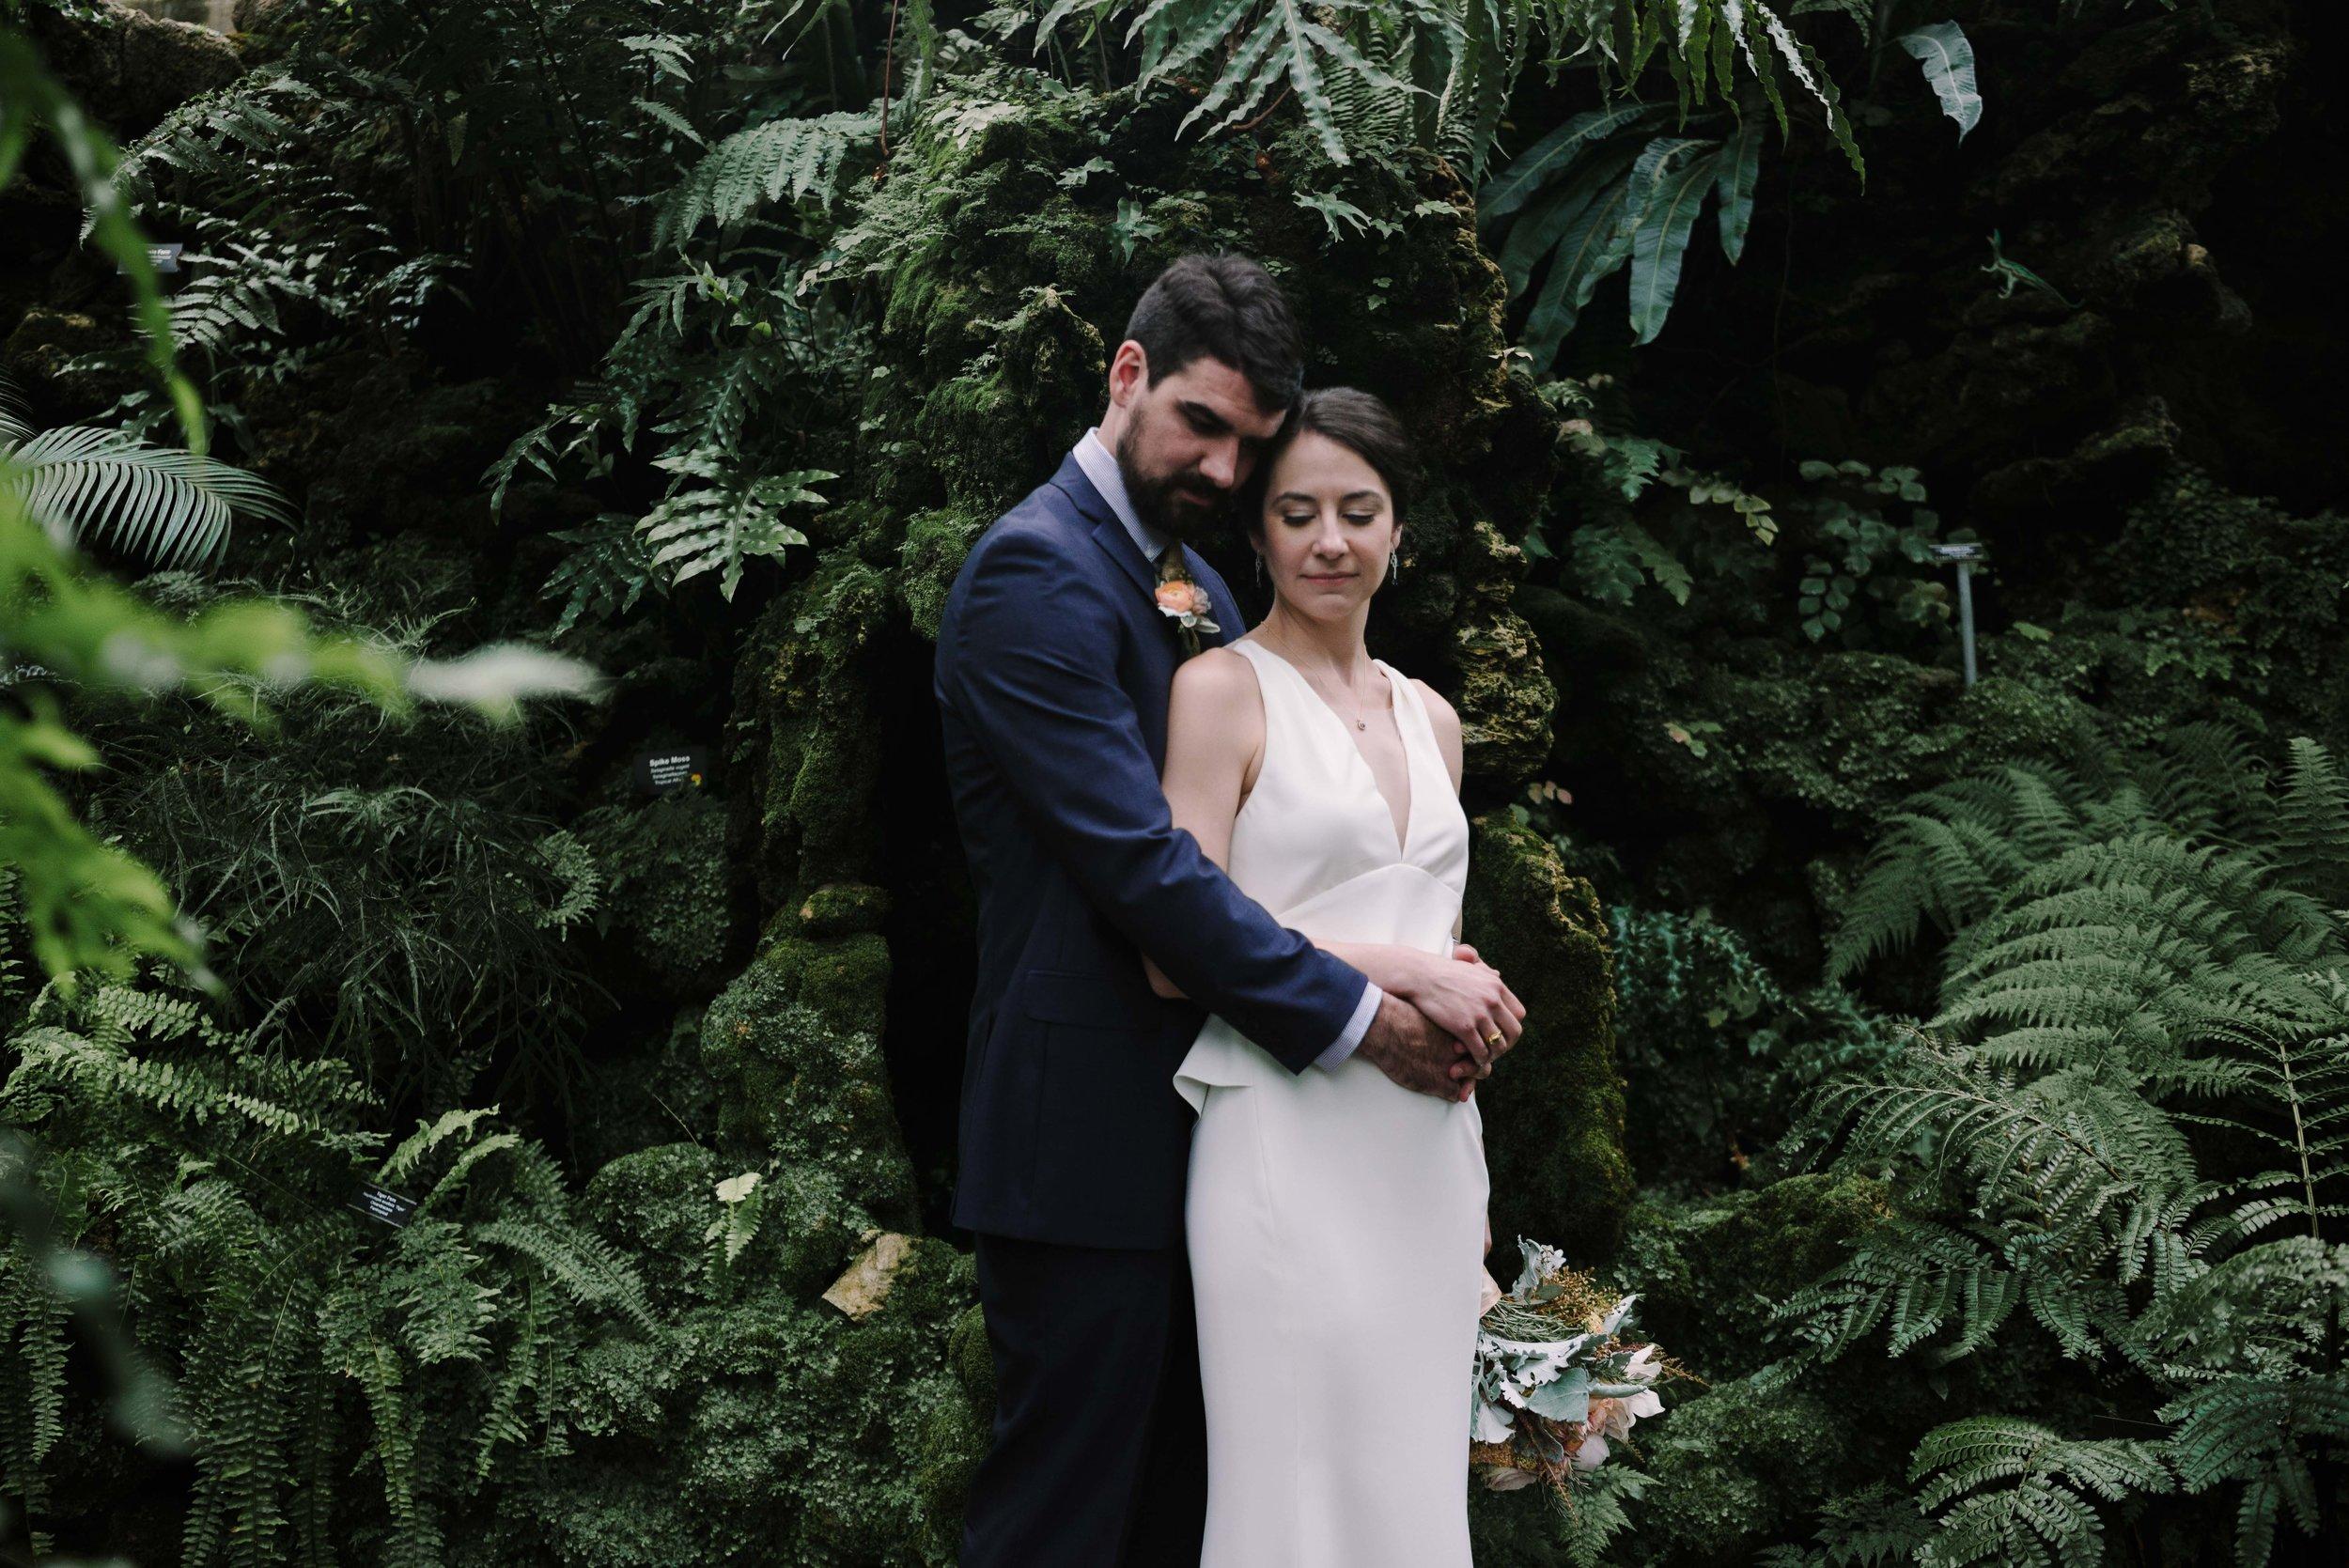 Patricia-Steve-Blog-Indianapolis-Wedding-31.jpg